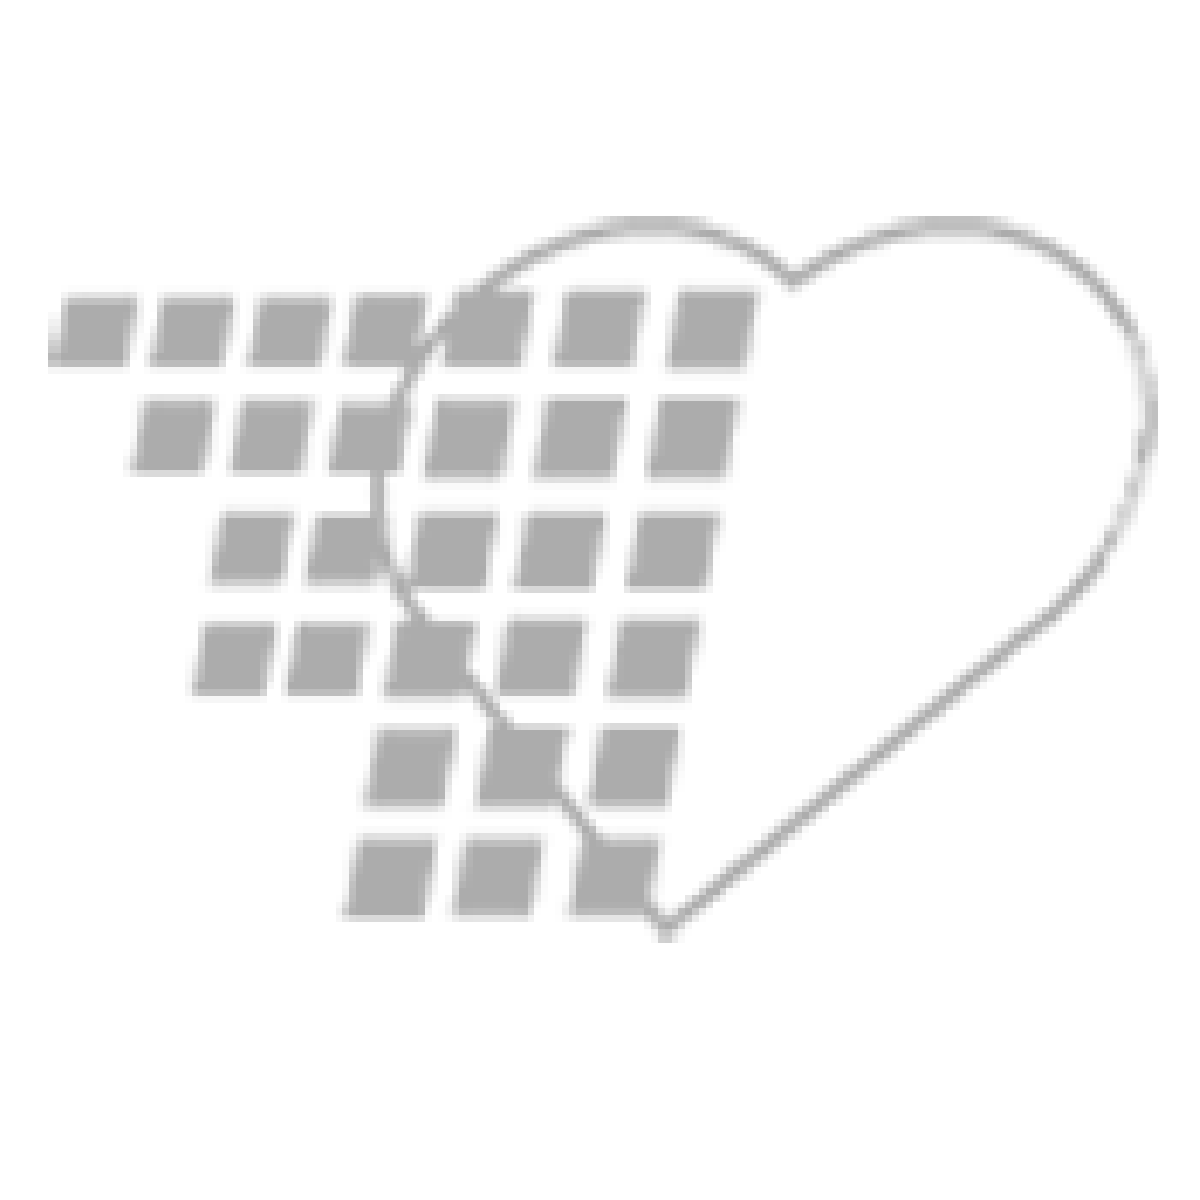 11-81-5350 Laerdal Interchangeable Catheterization and  Enema Simulator